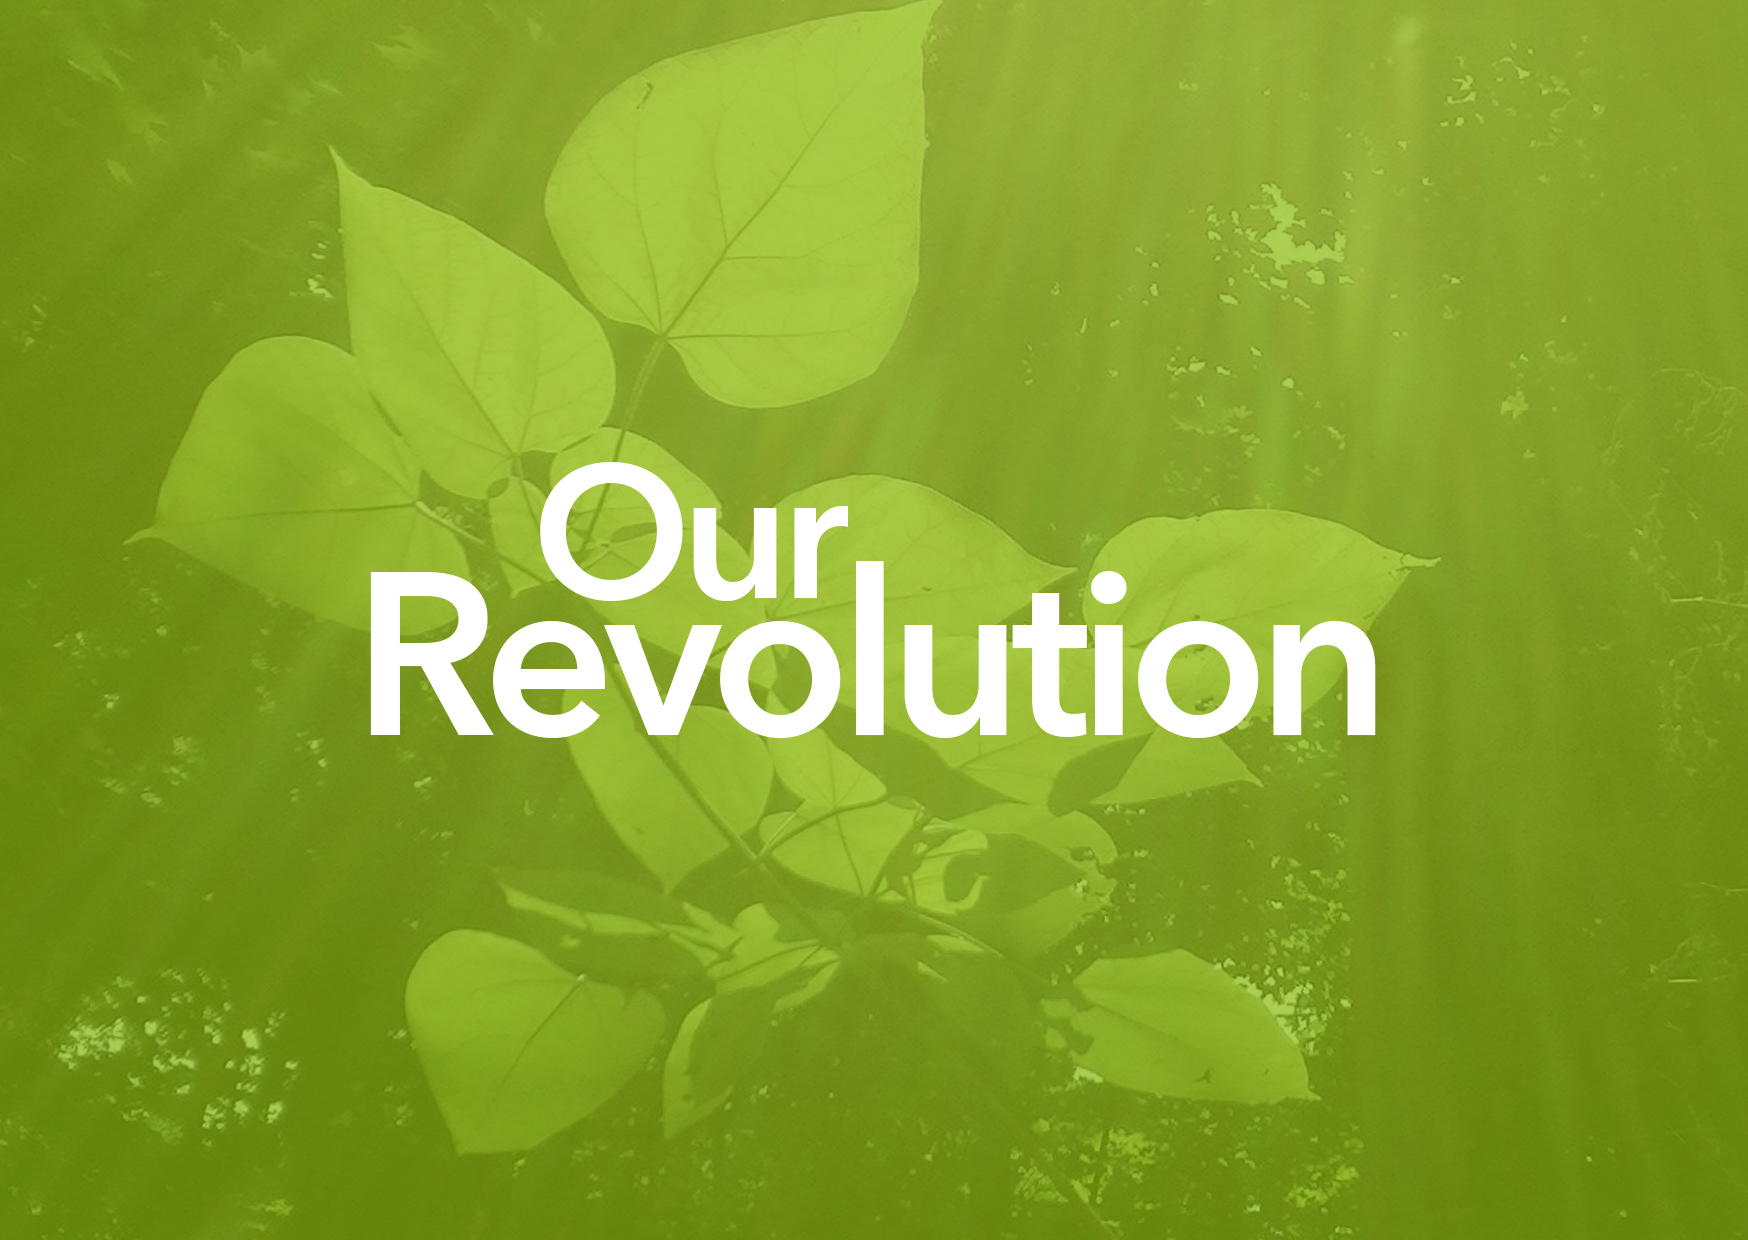 ourrevolution